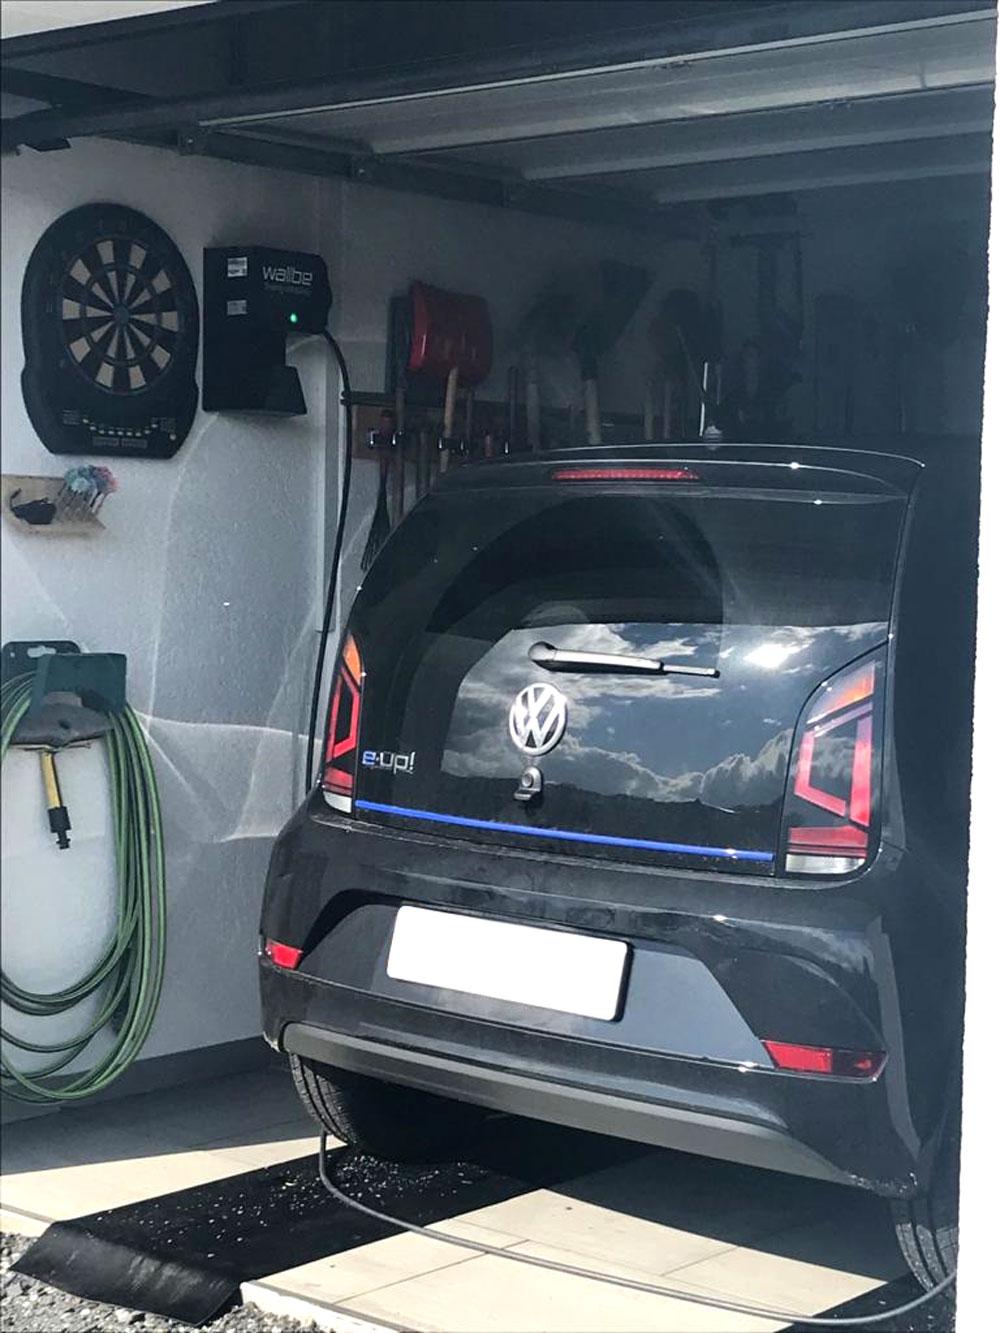 E-Auto-Stromtankstelle-wallbox-Nister-MANN-Energie.jpg